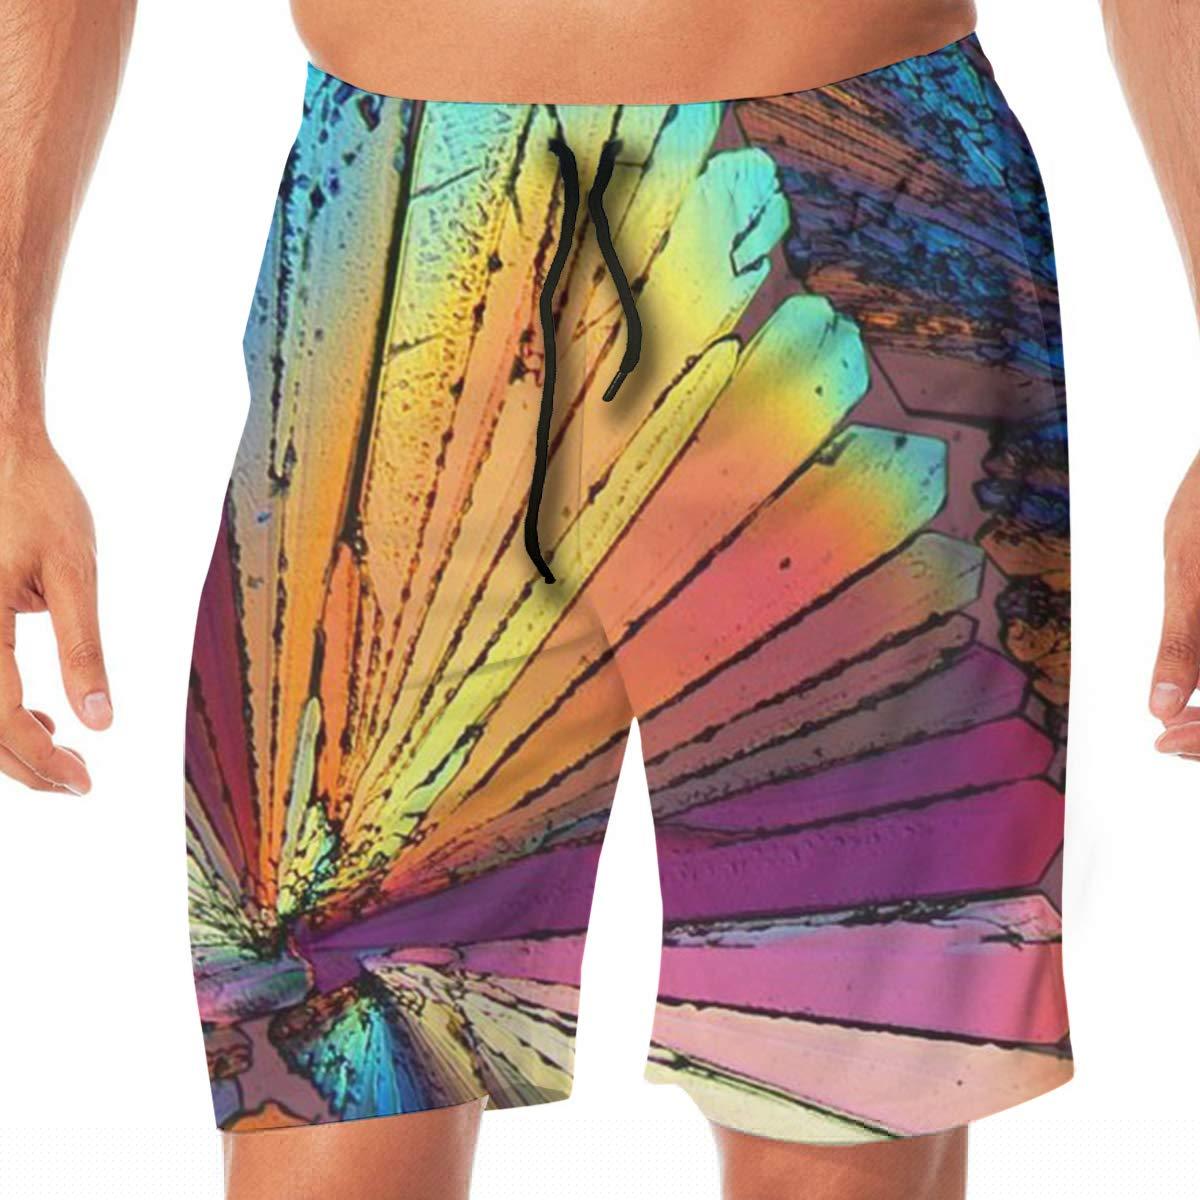 SEXTDSFD Colored Stones Mens Running Casual Short Beach Pants Swim Trunks Drawstring Board Shorts Swimwear